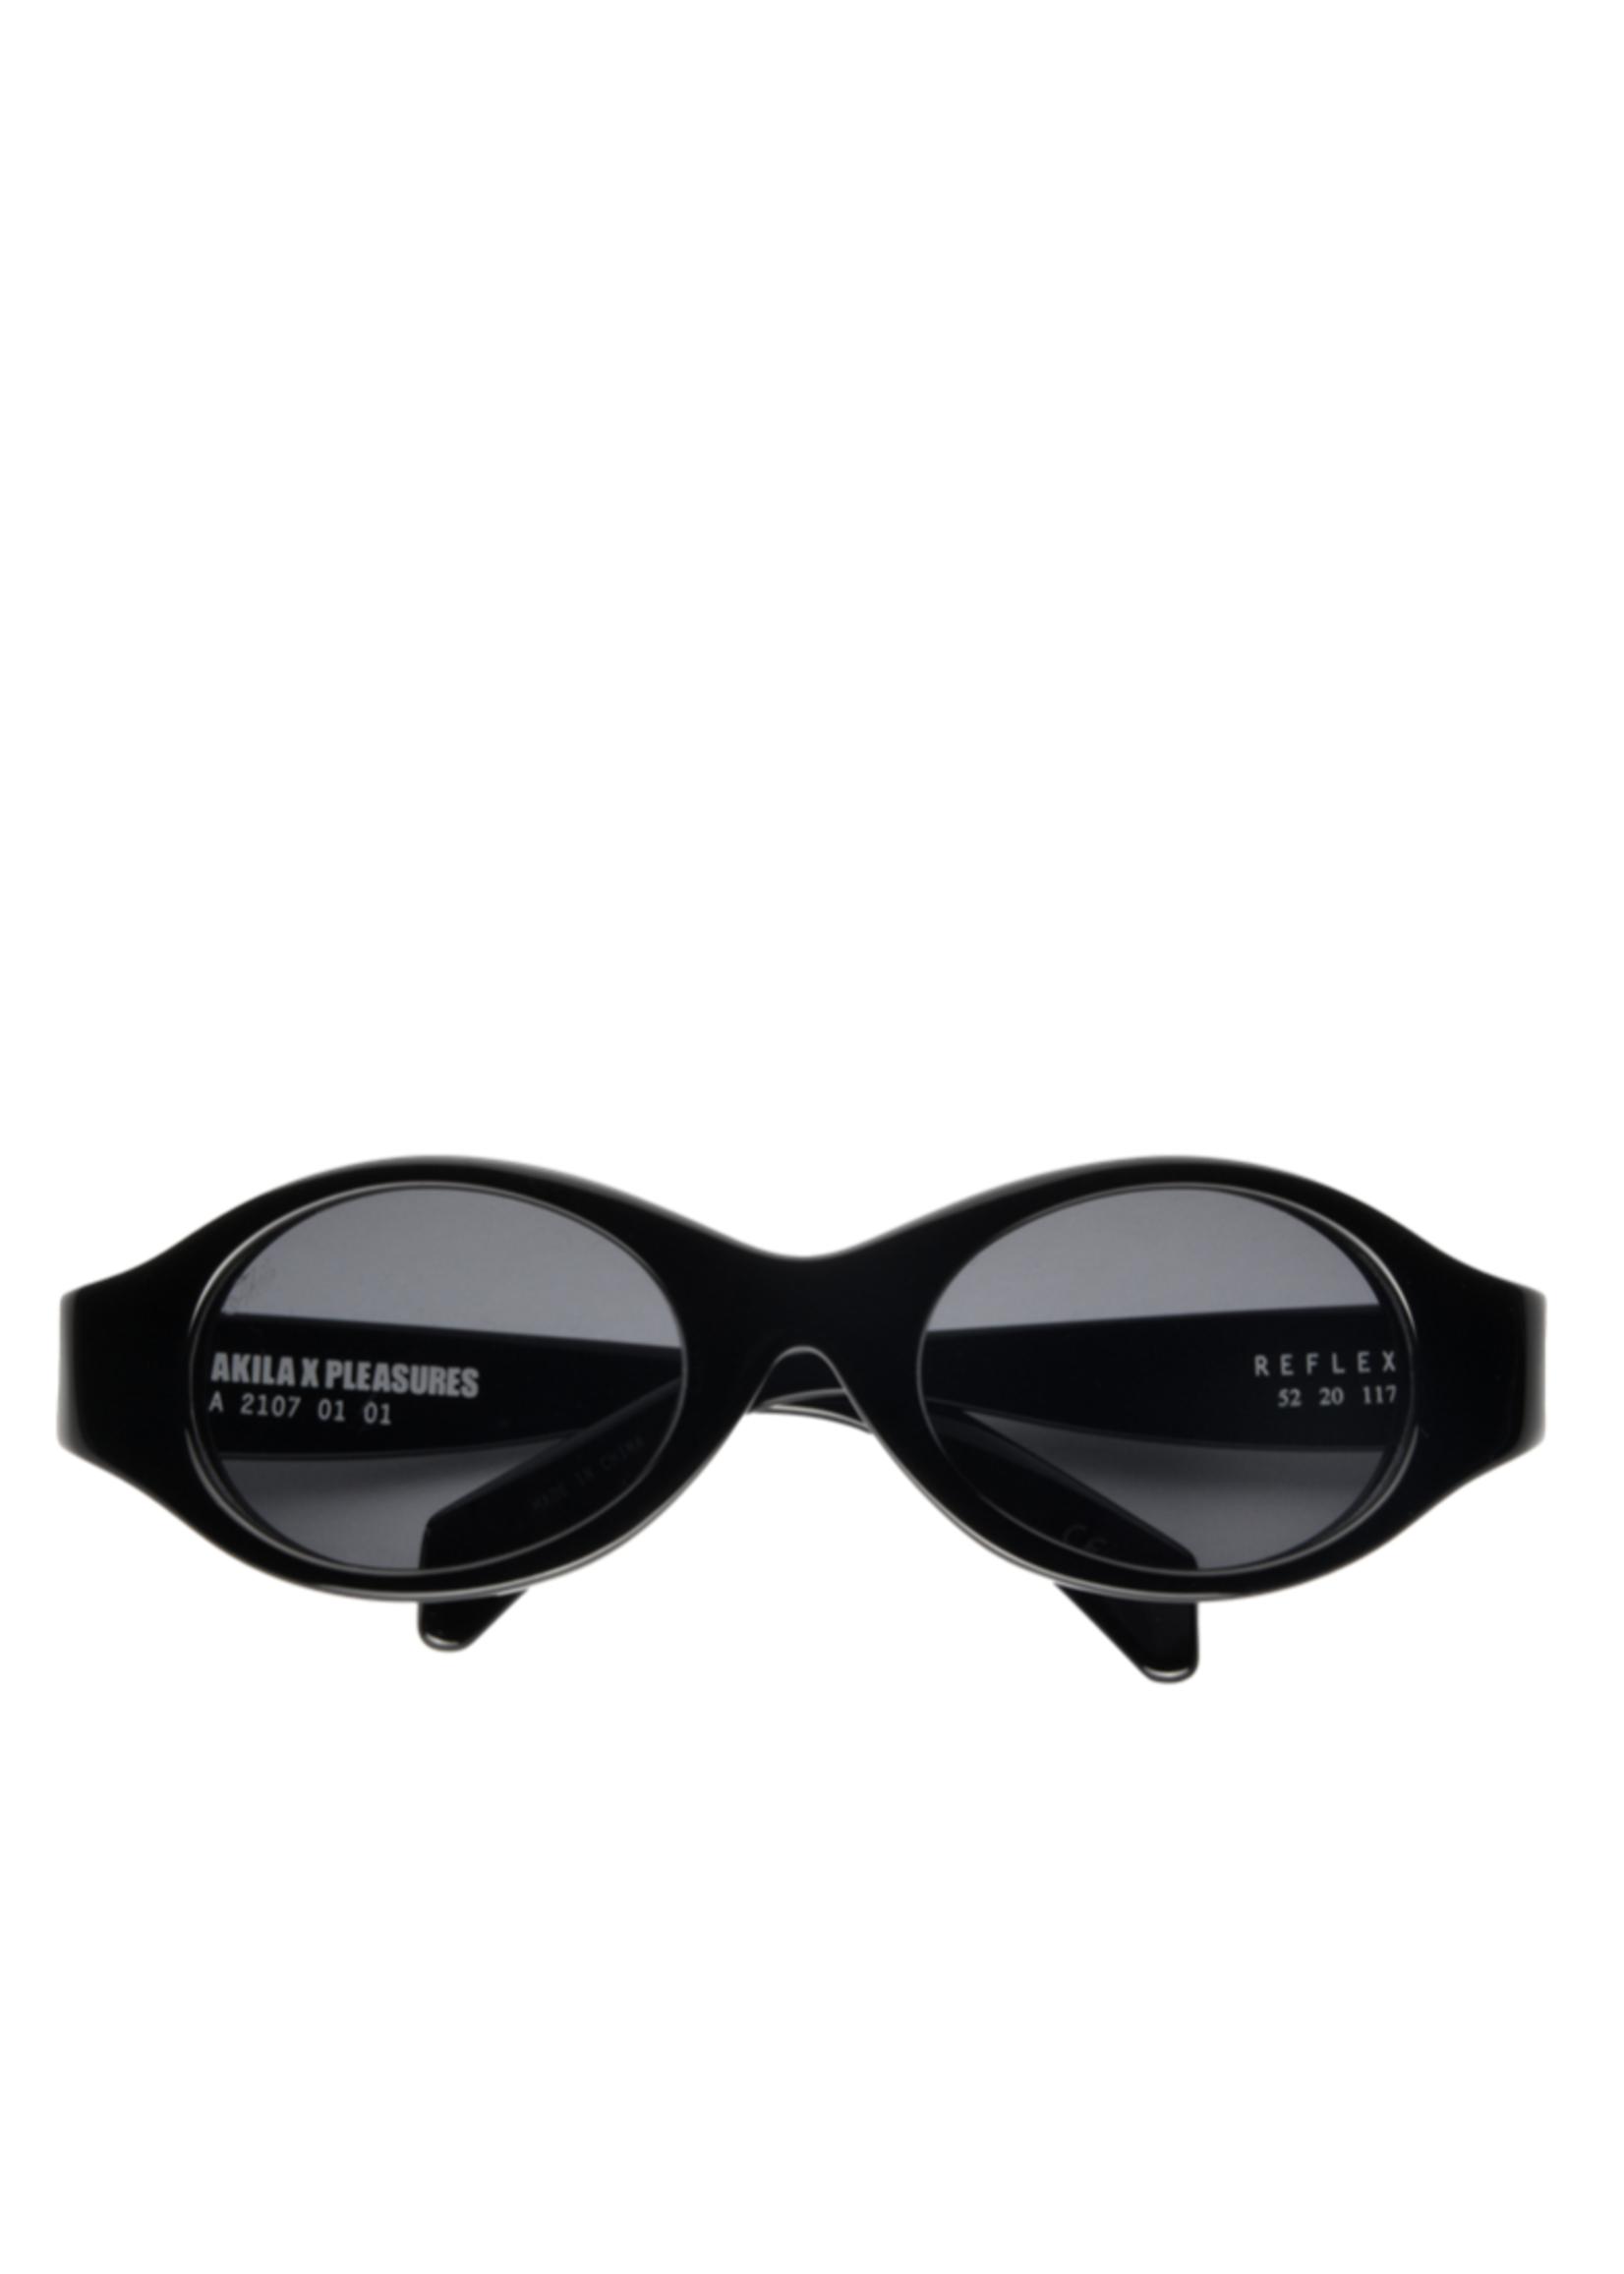 PLEASURES PLEASURES x AKILA Reflex Sunglasses in Black